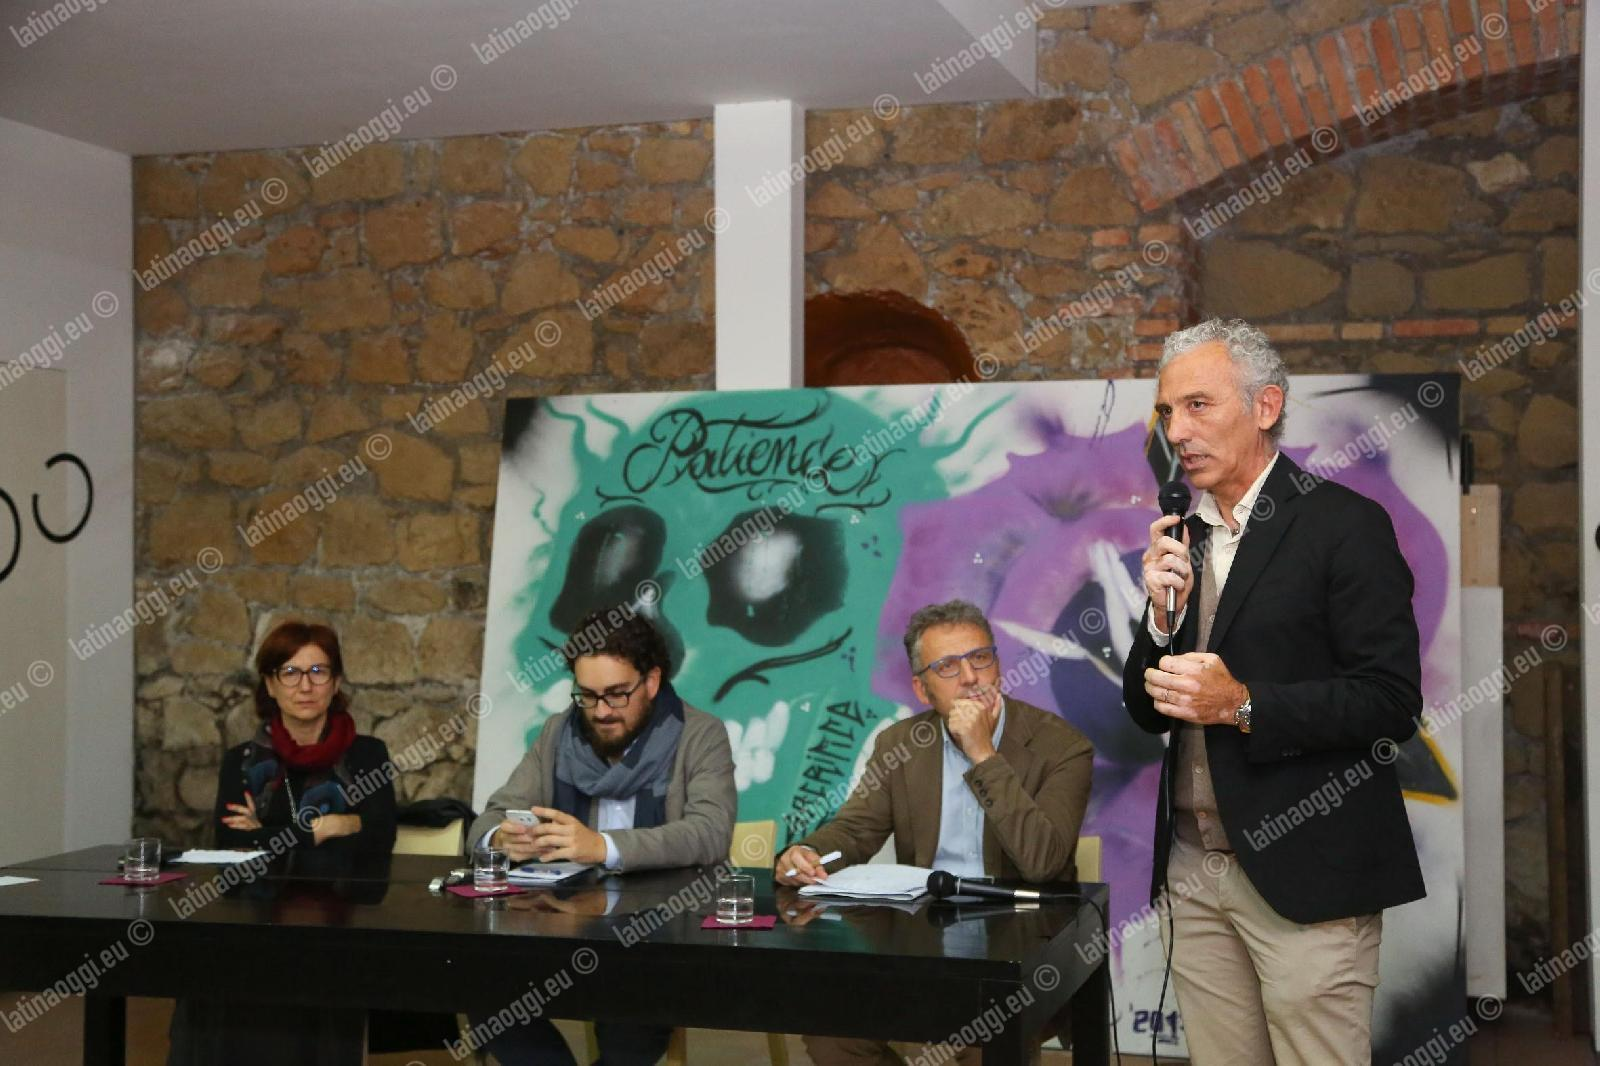 Lista civica zingaretti candidating